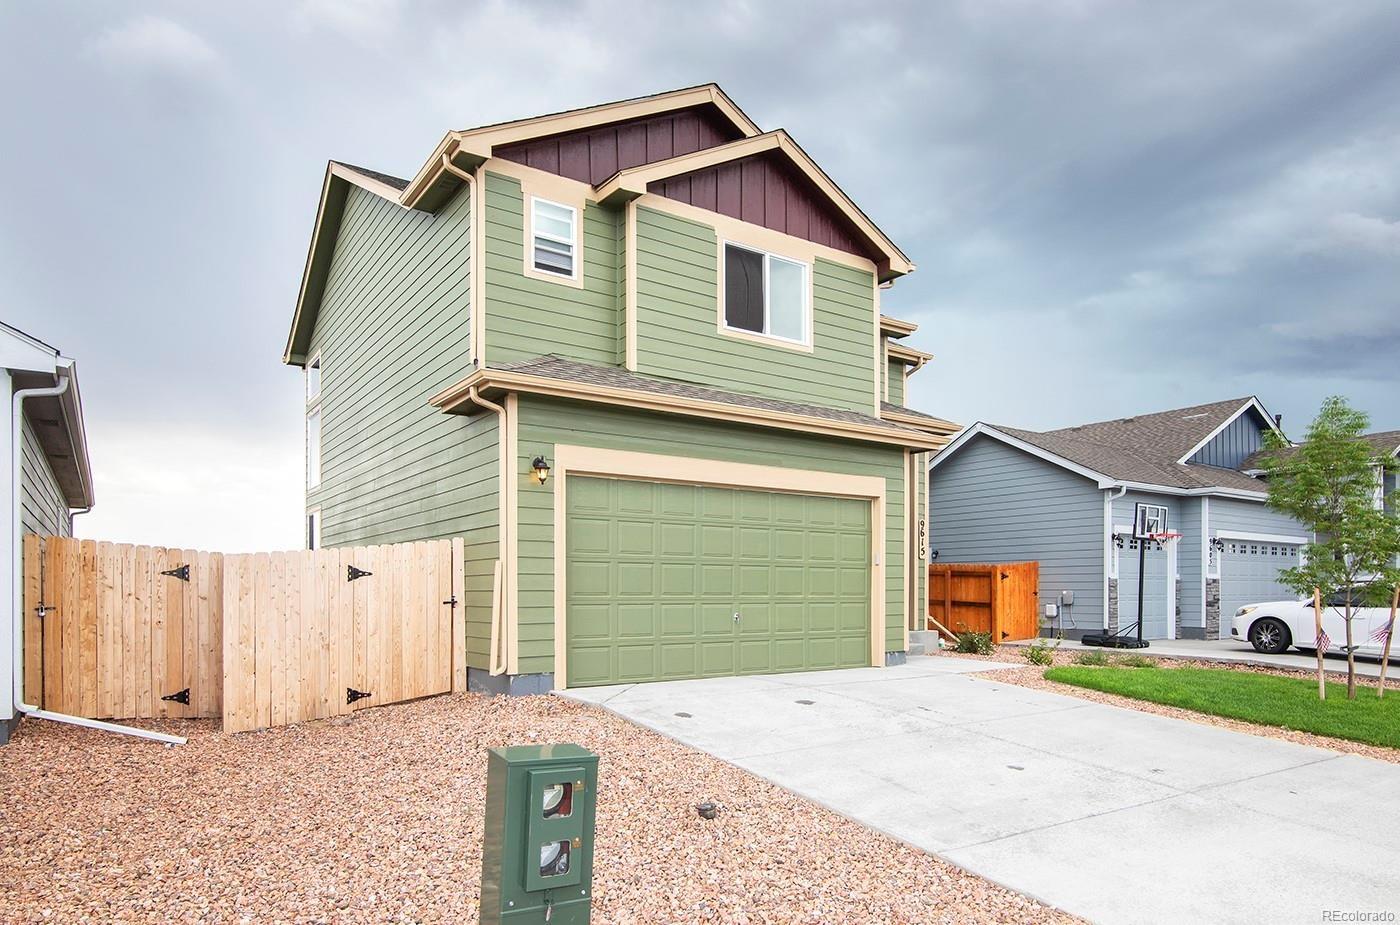 MLS# 7058019 - 2 - 9615 Rubicon Drive, Colorado Springs, CO 80925